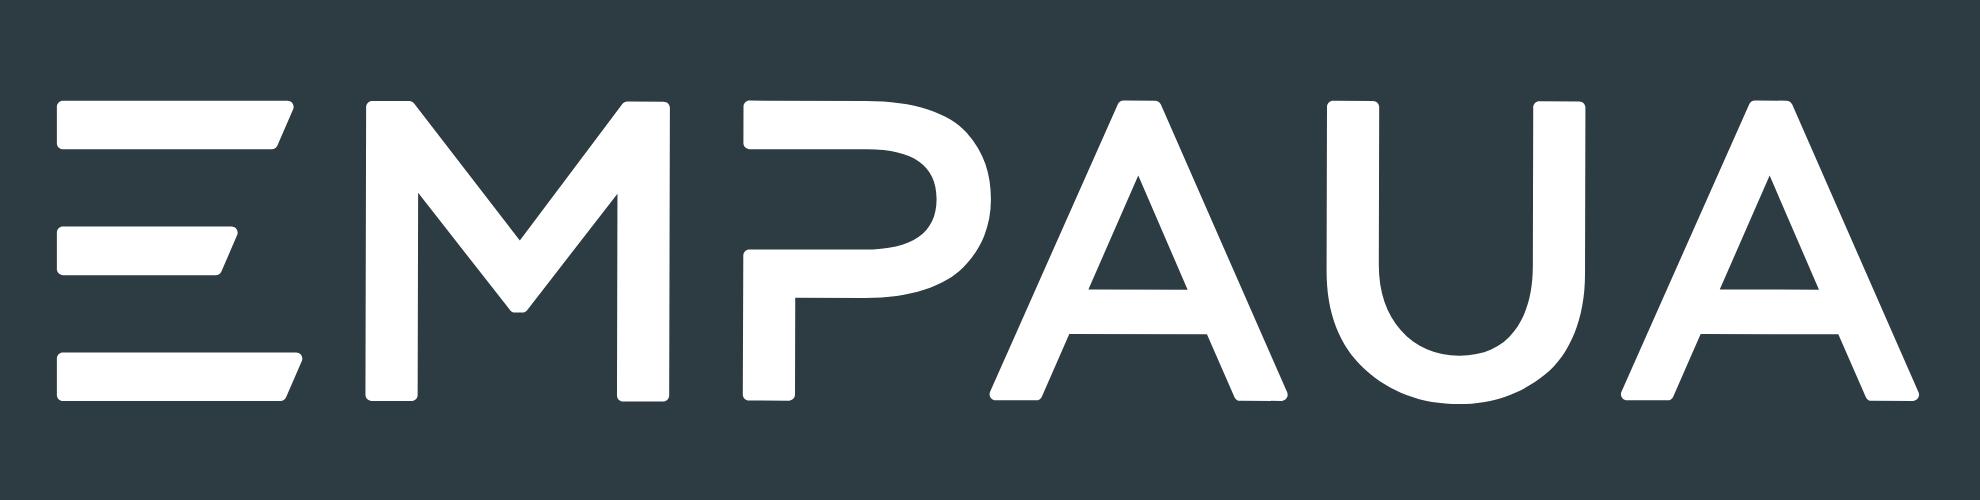 EMPAUA_logo_official_1920x1080 px_white & black background (PDF)